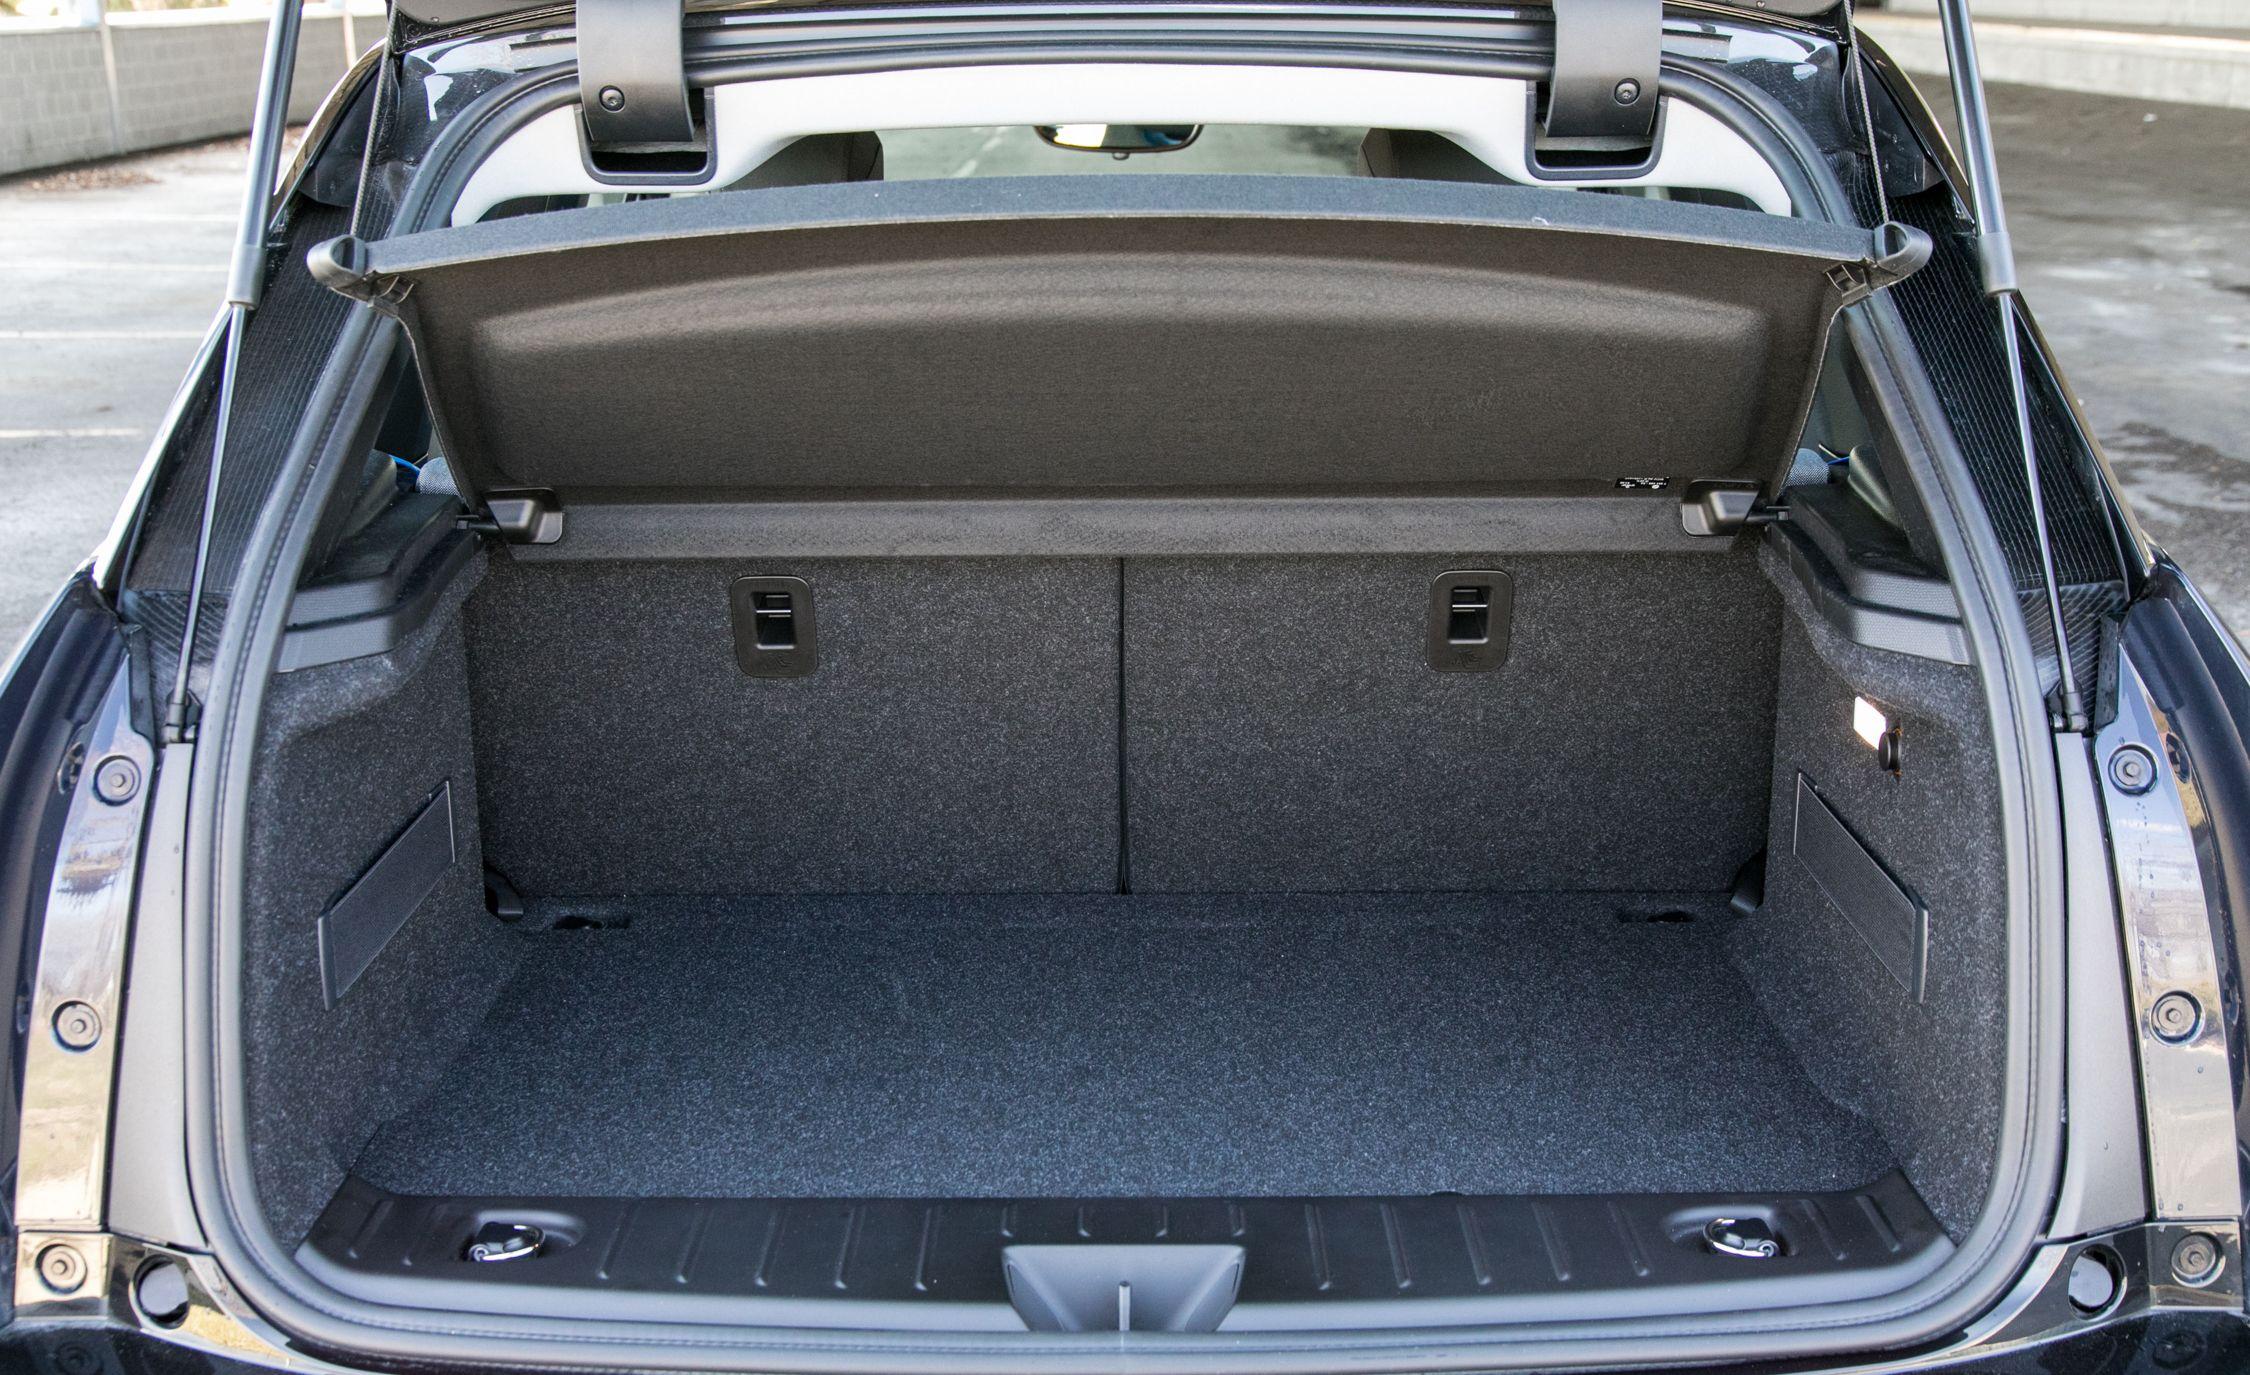 BMW i3 Reviews BMW i3 Price s and Specs